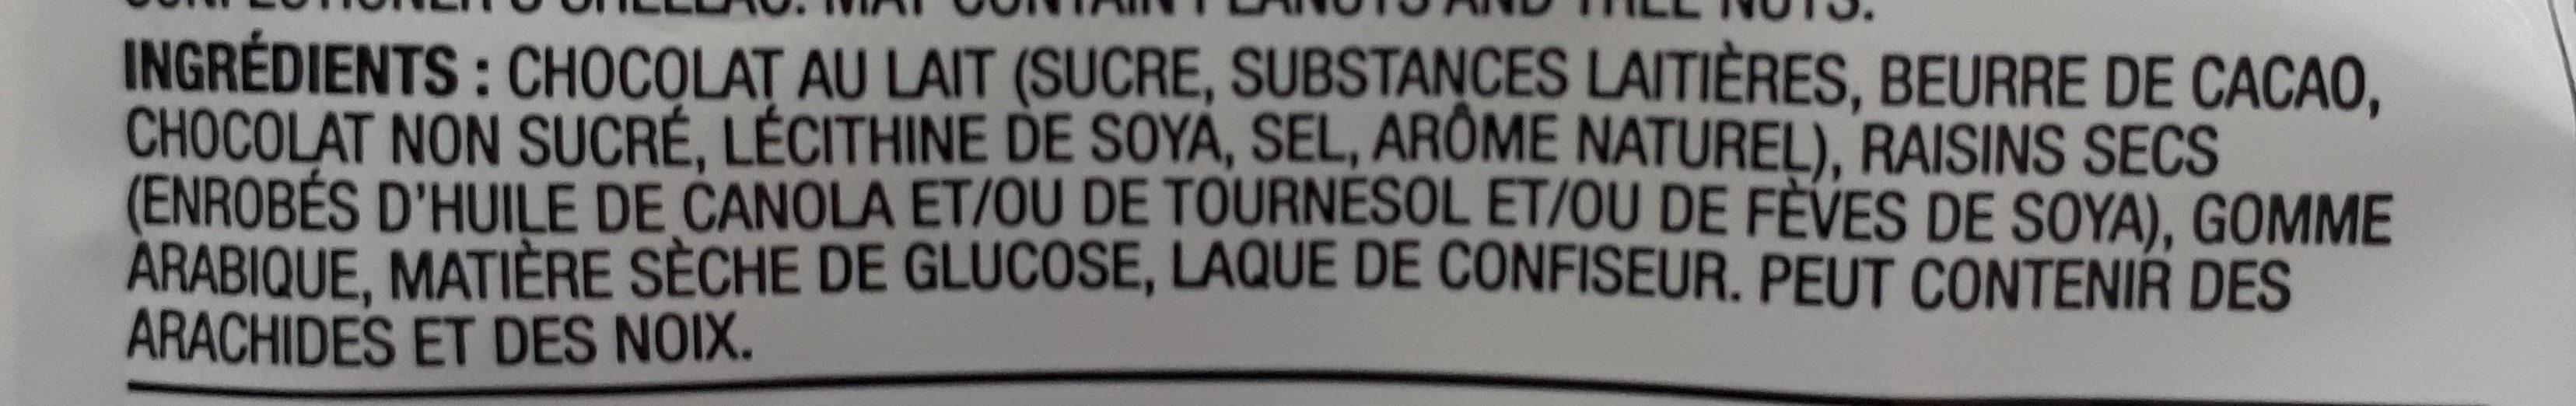 Milk chocolate covered raisins - Ingredients - fr